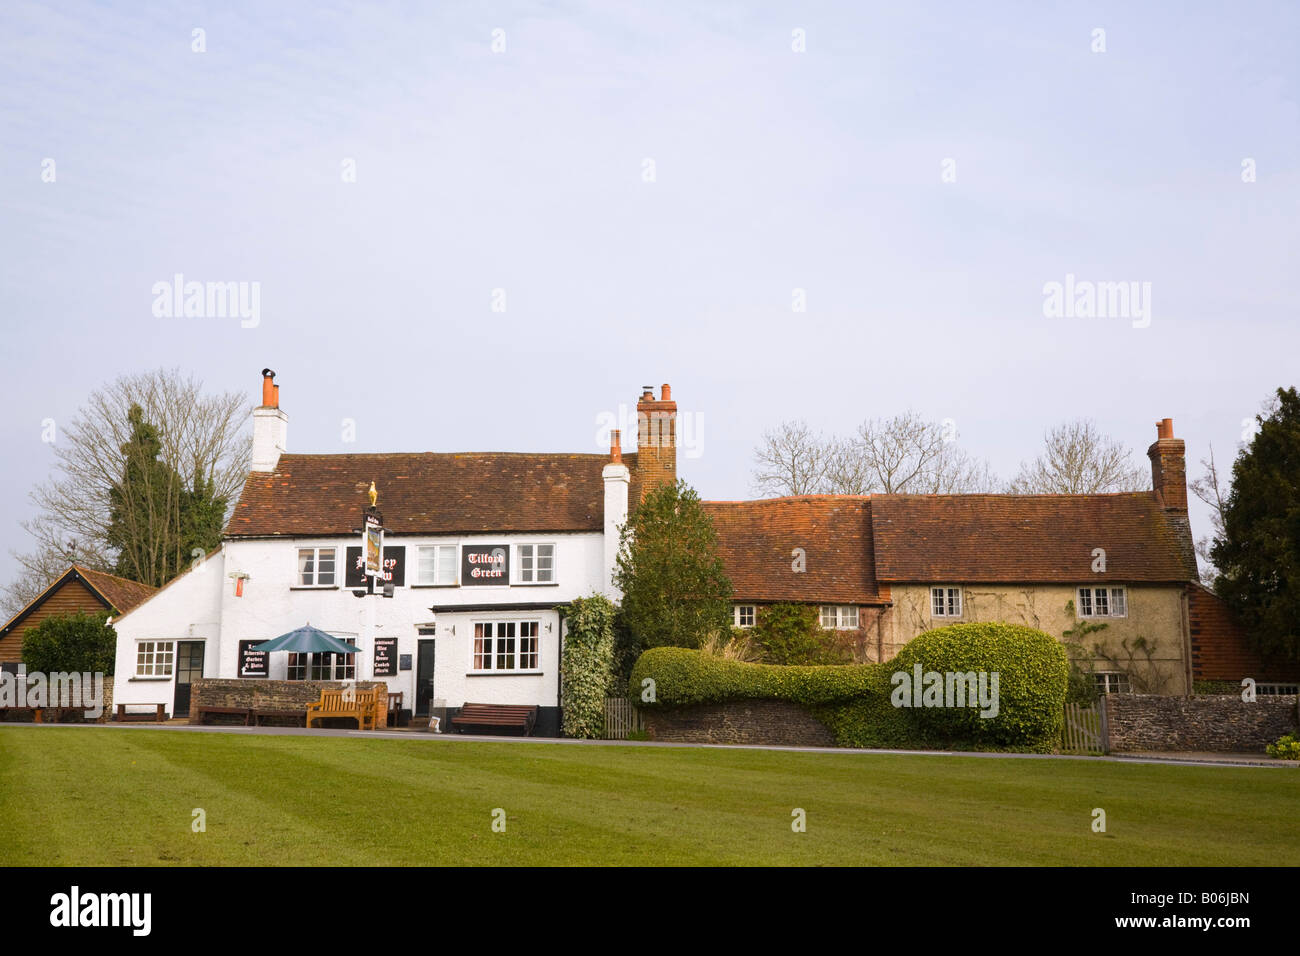 Tilford Surrey England UK. The Barley Mow traditional rural village pub overlooking village green - Stock Image